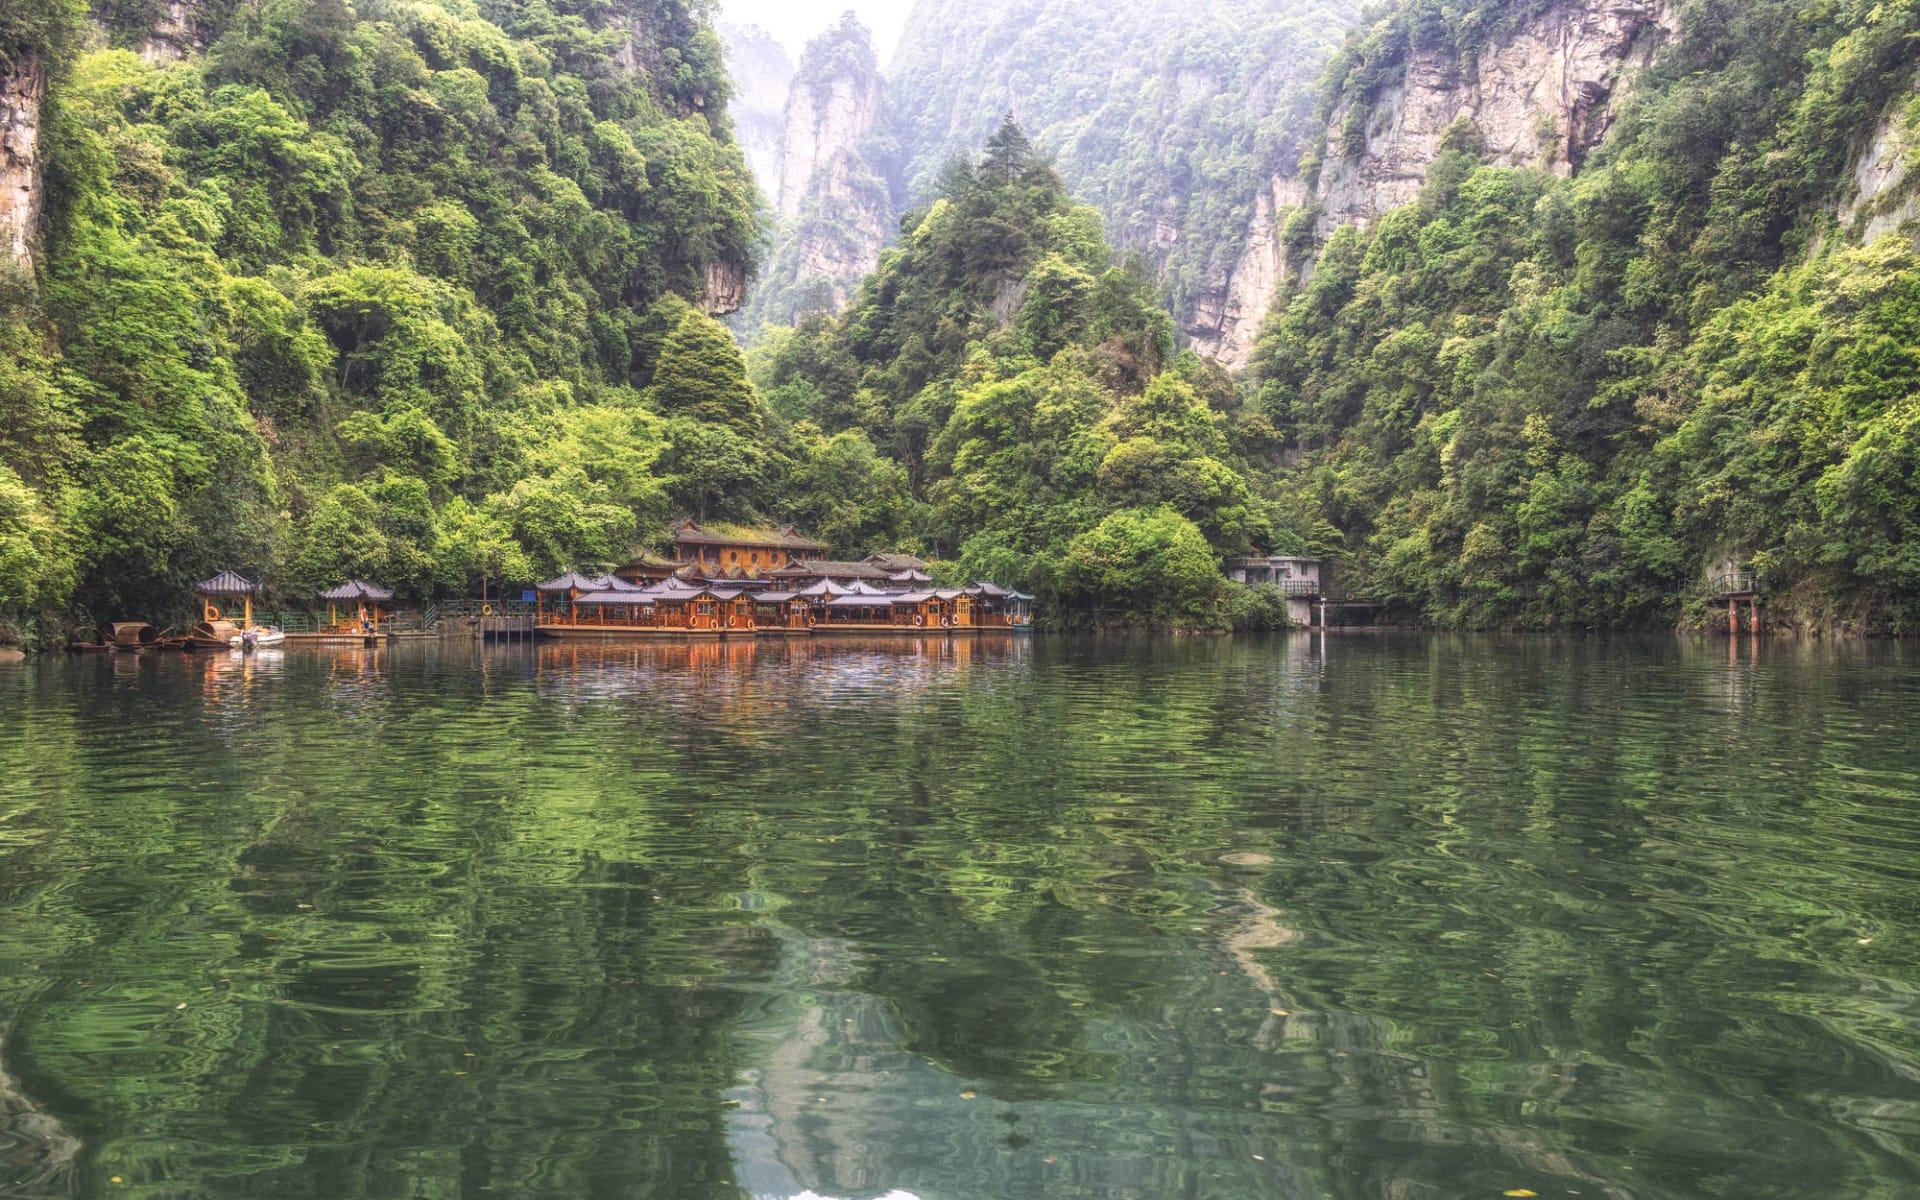 Märchenhaftes Südchina ab Shanghai: Zhangjiajie Baofeng Lake at Wulingyuan scenic area